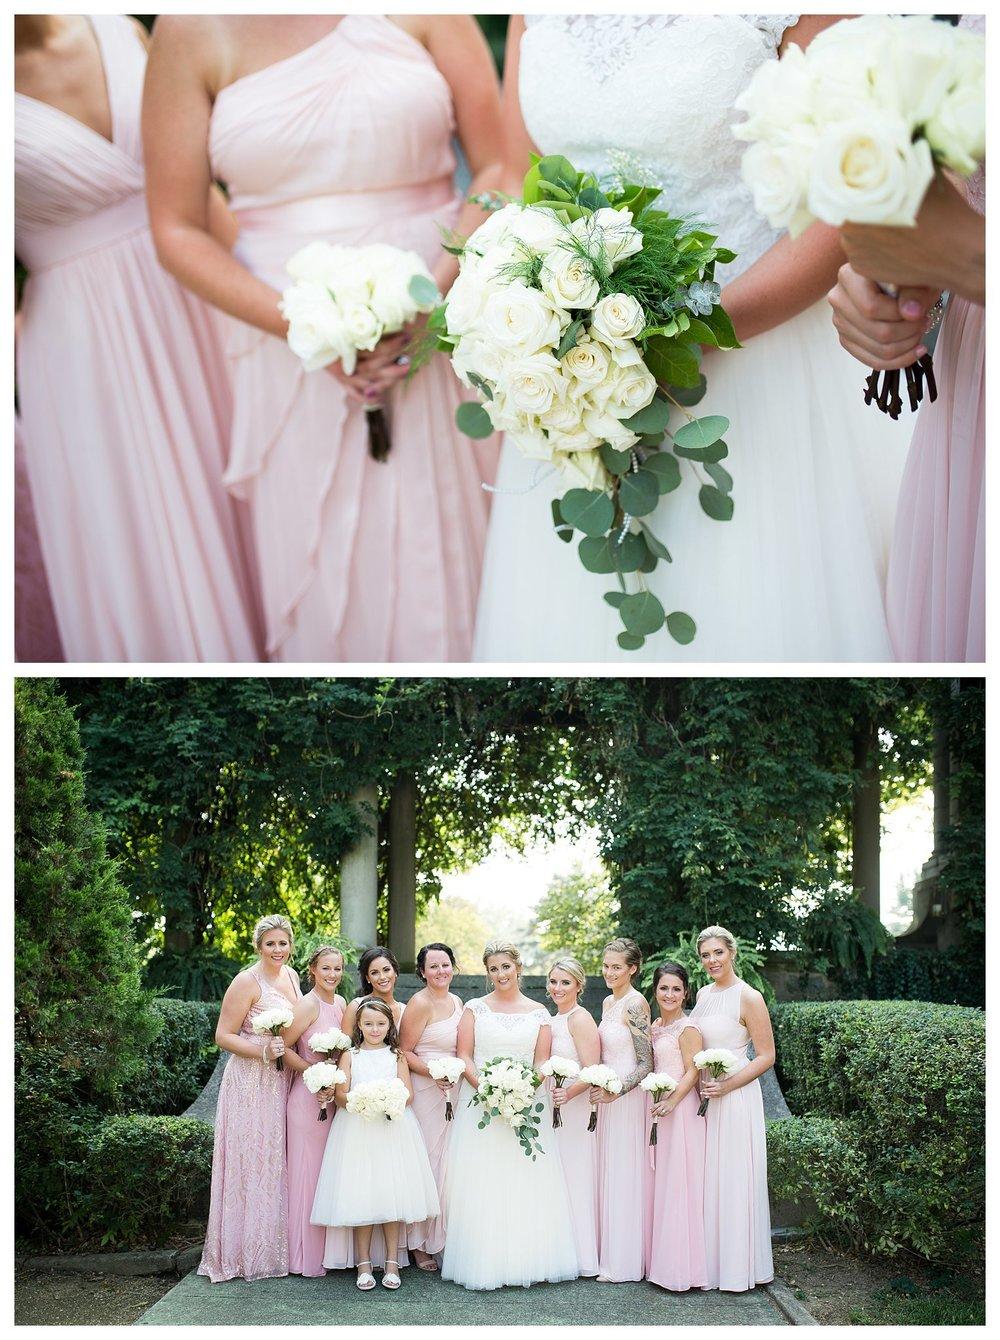 laurel-court-wedding-everleigh-photography-cincinnati-wedding-photographer-northern-ky-wedding-photographer-19